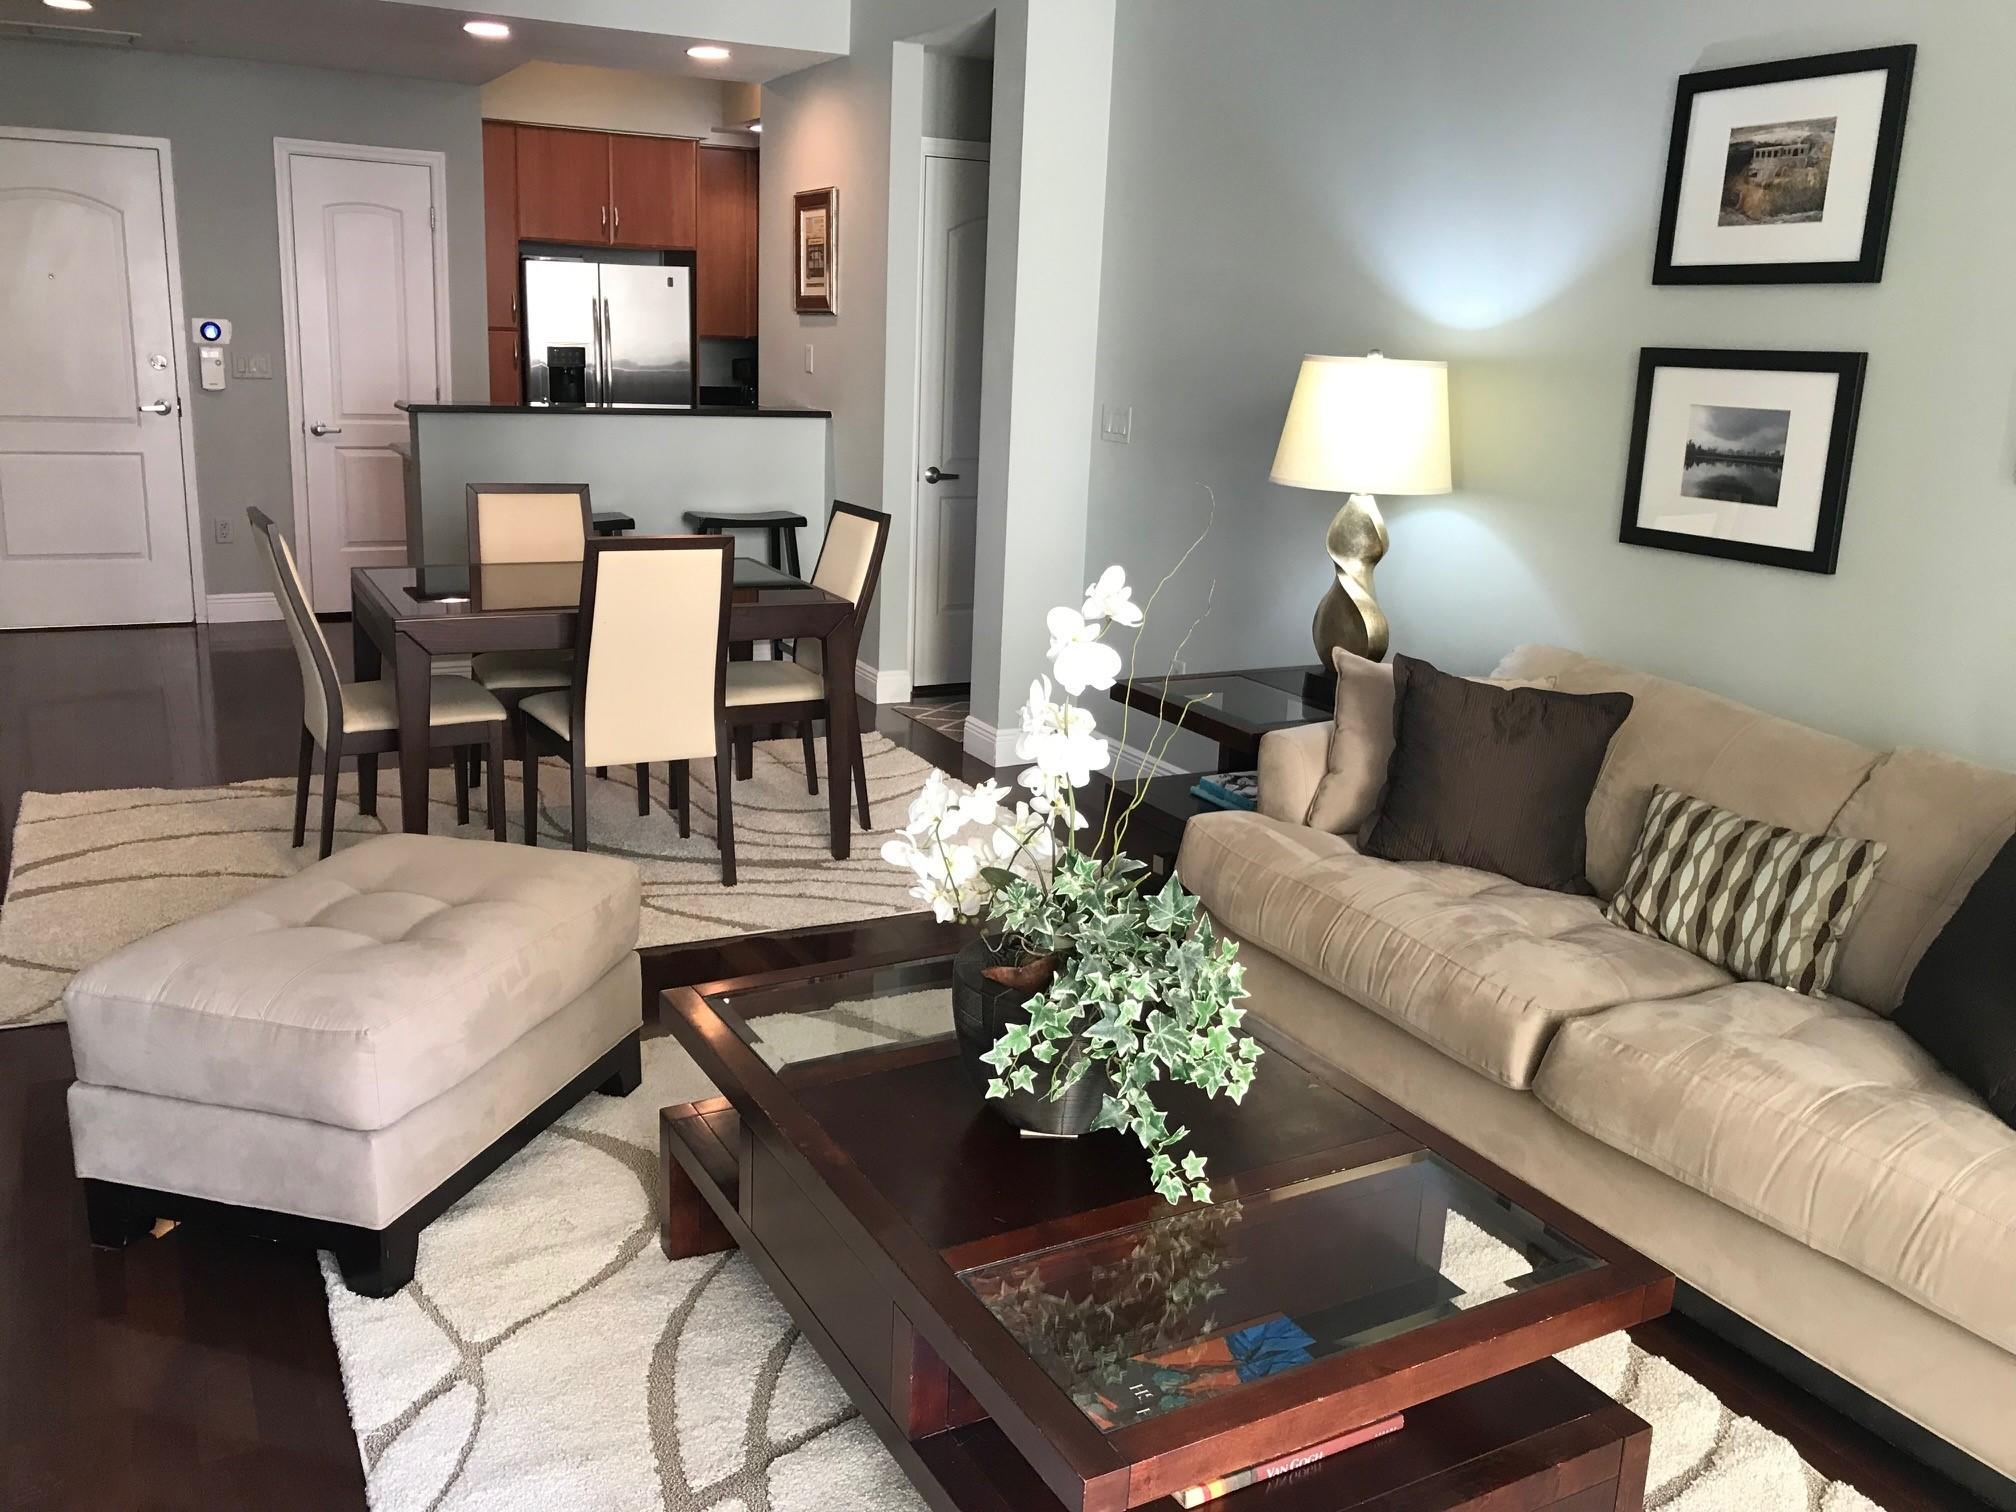 801 S Olive Avenue, 929 - West Palm Beach, Florida